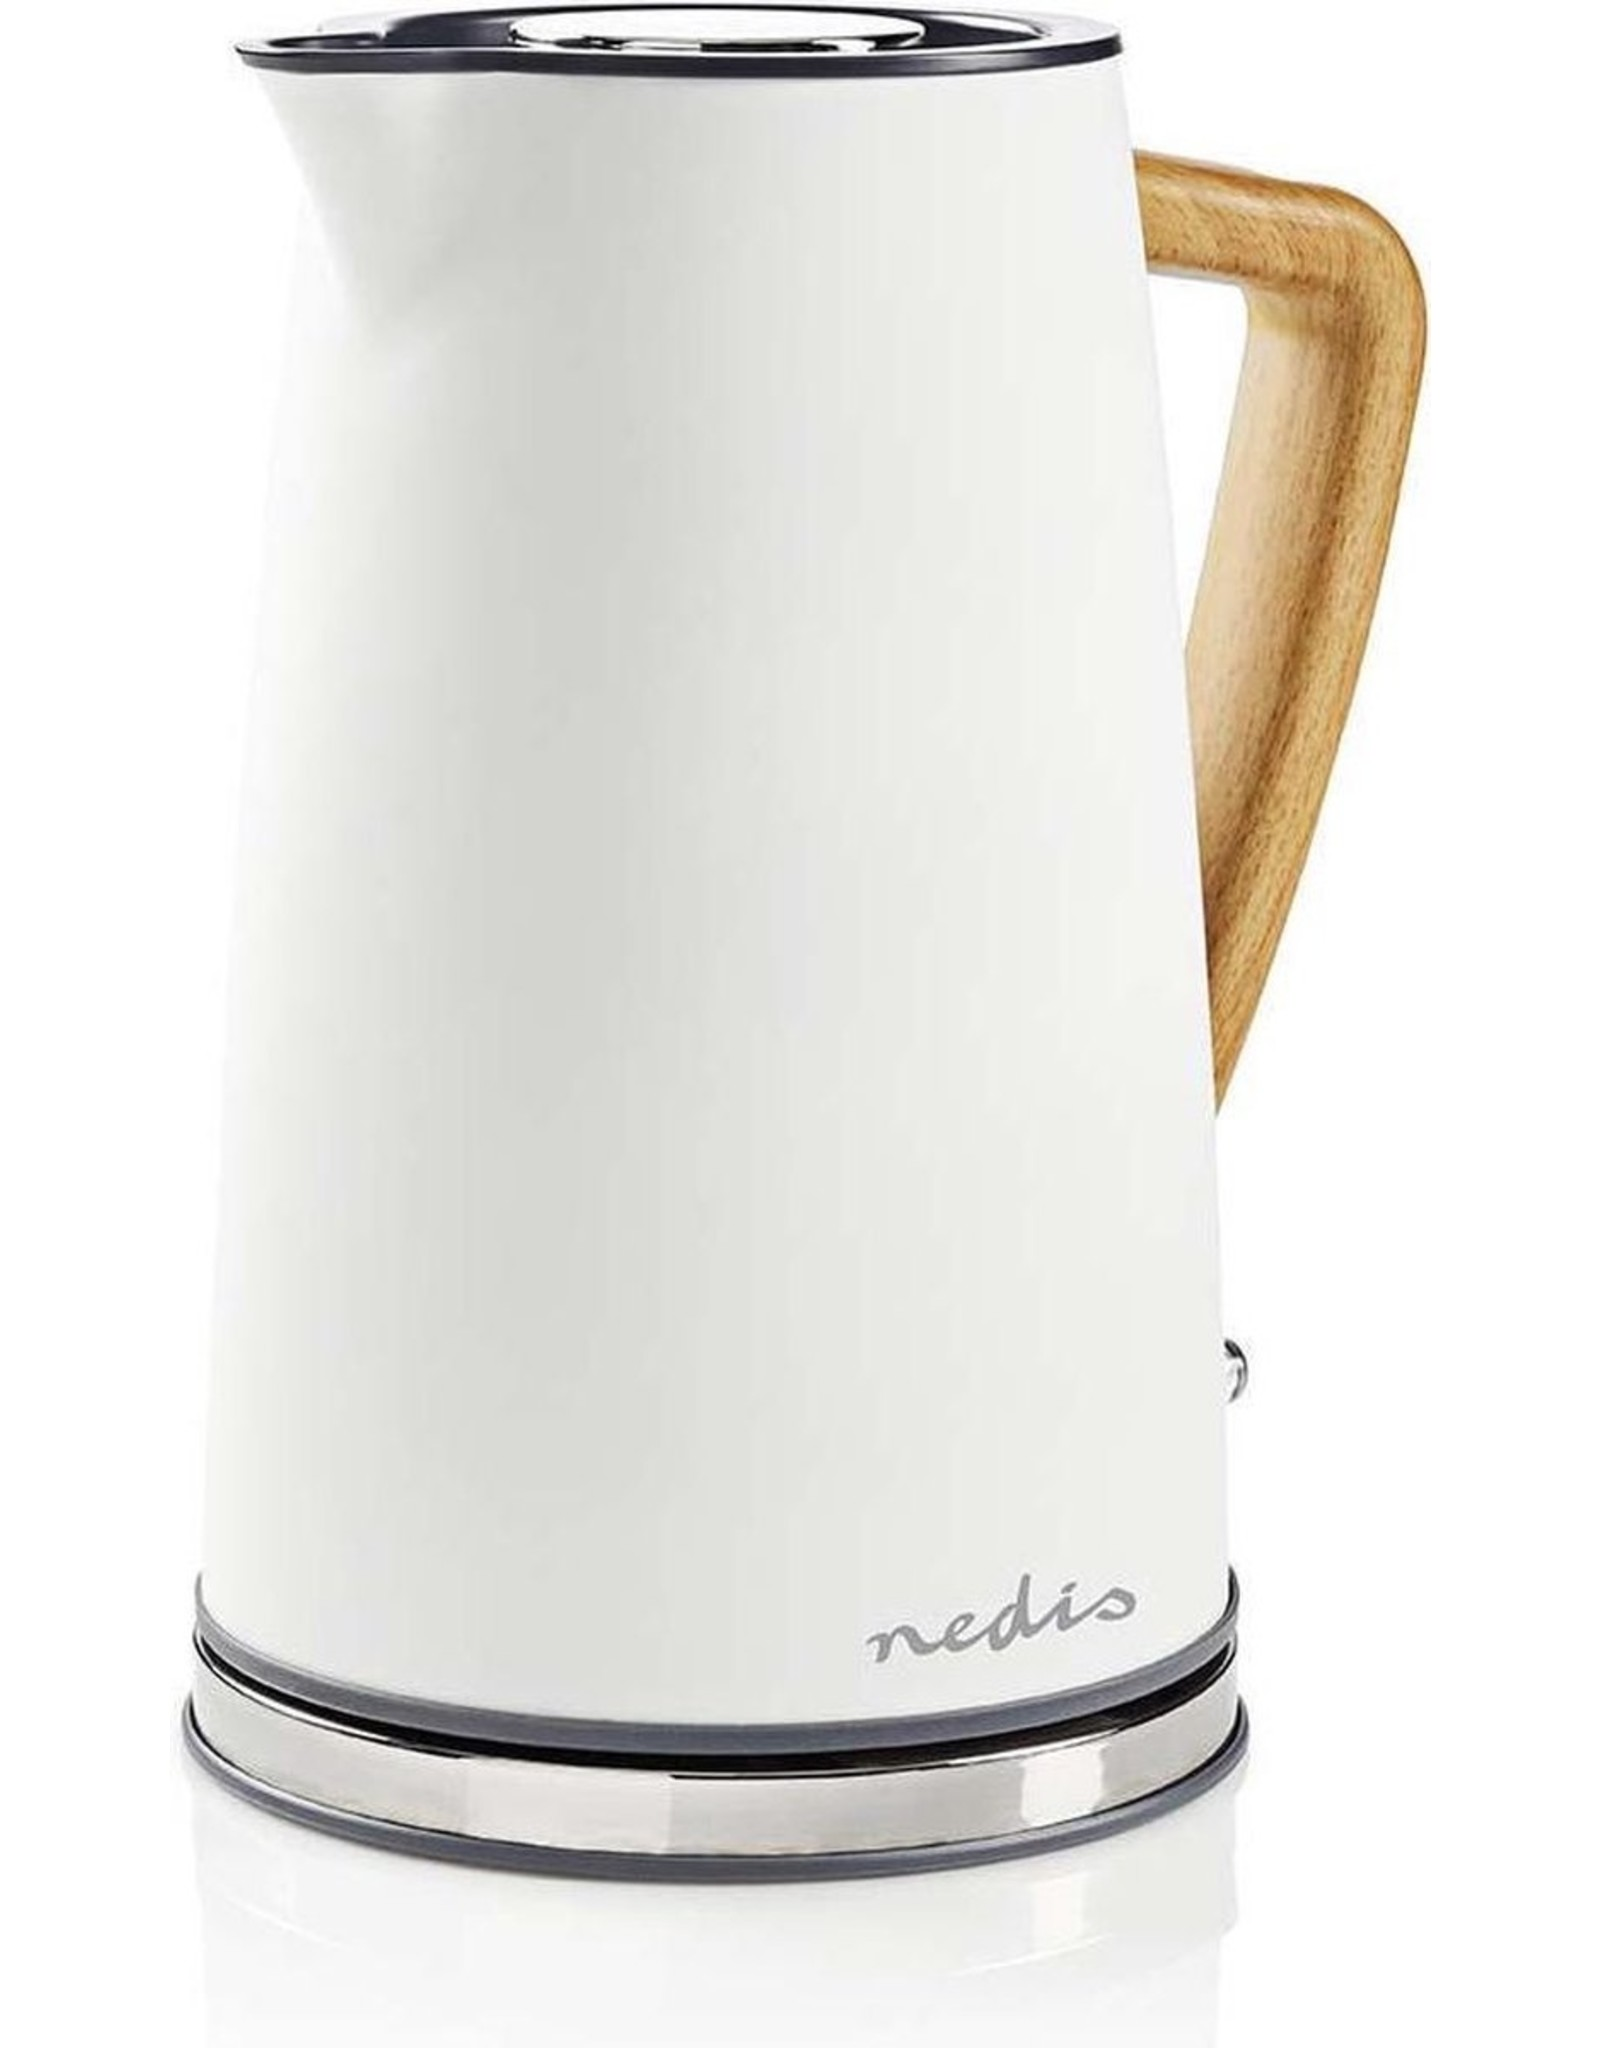 Nedis Nedis - Waterkoker - Modern Design  - 1.7L